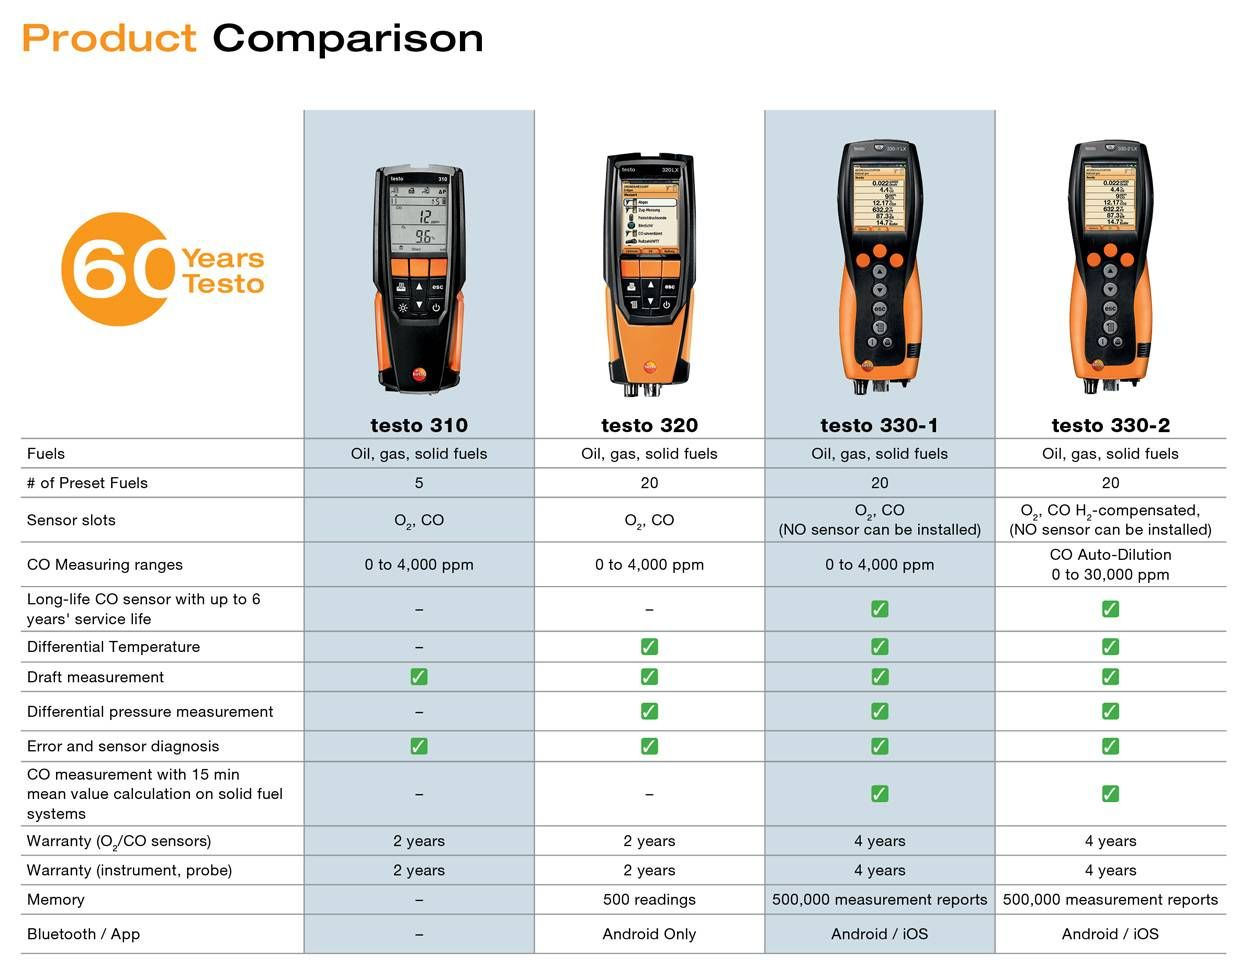 Testo-2018-Fall-Promo-Product-Comparison-Image.jpg